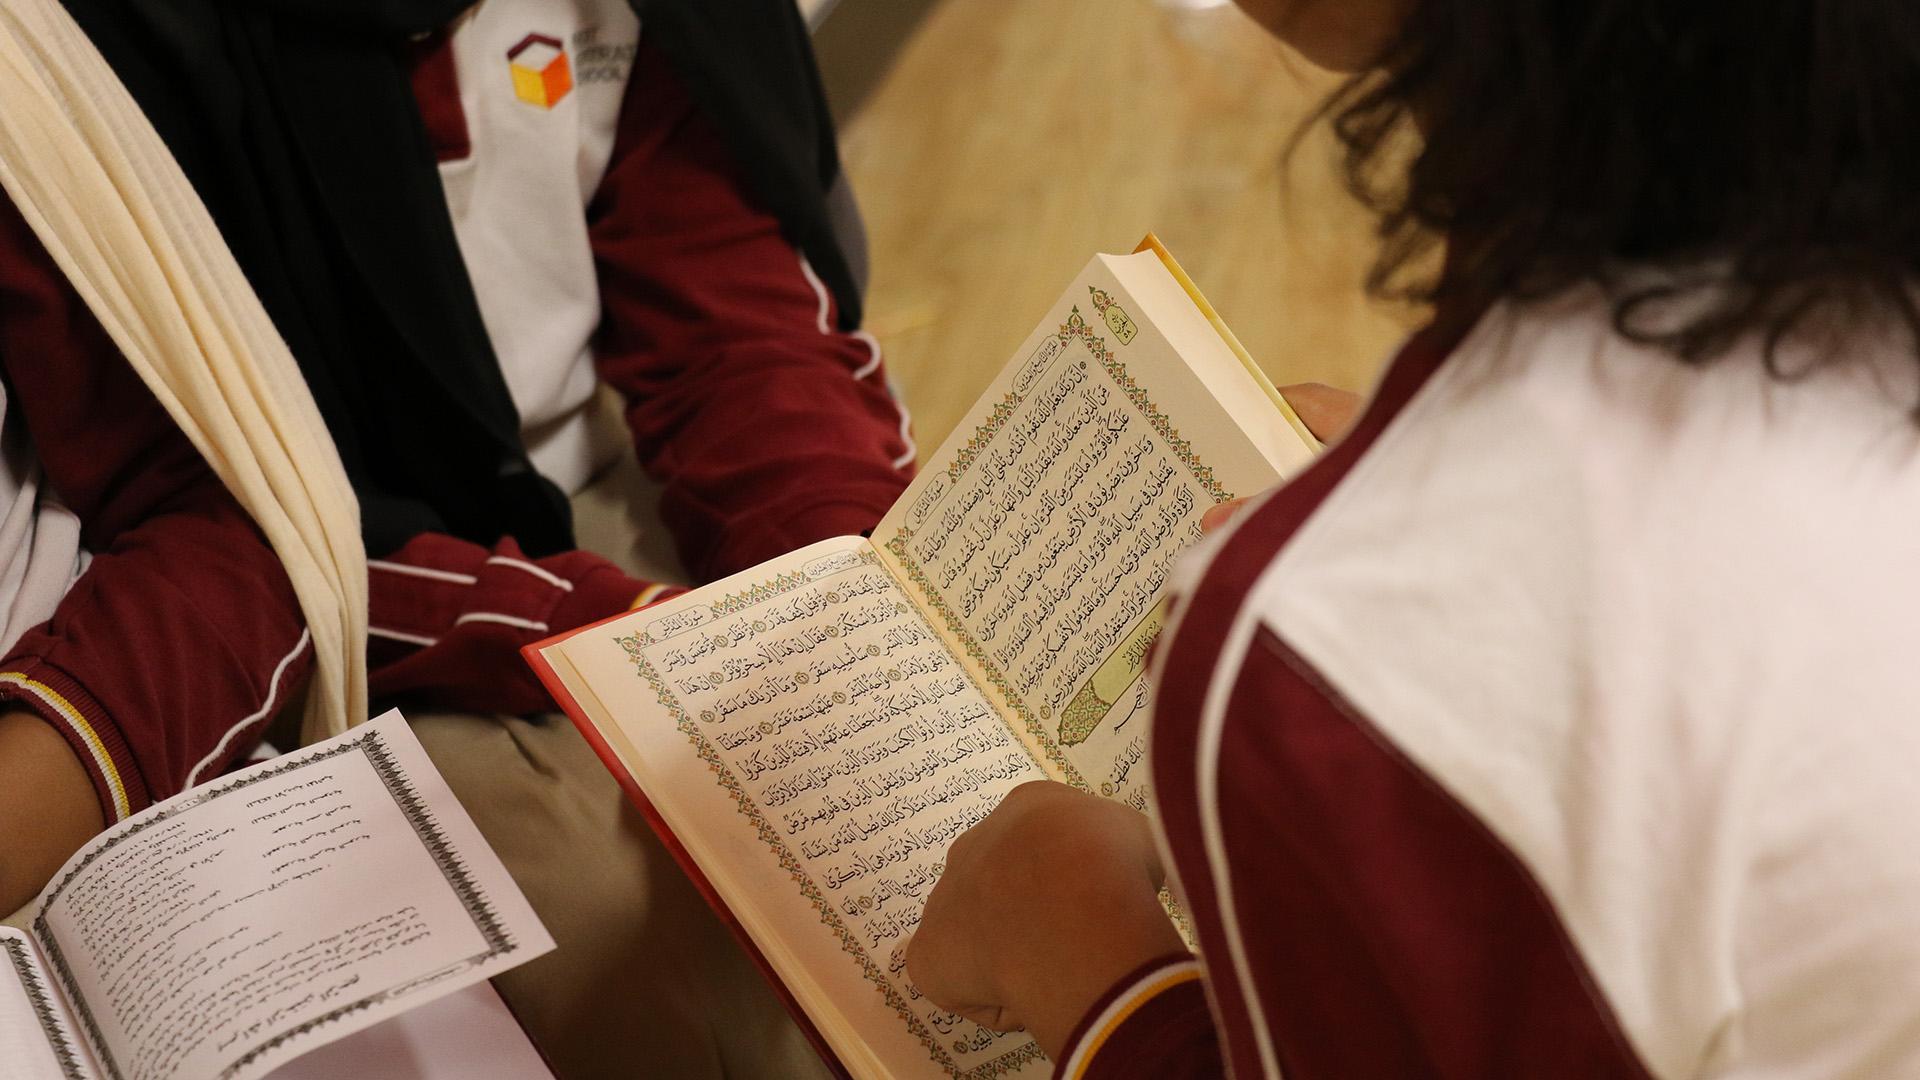 EXCEPTIONAL ARABIC & ISLAMIC STUDIES PROGRAM